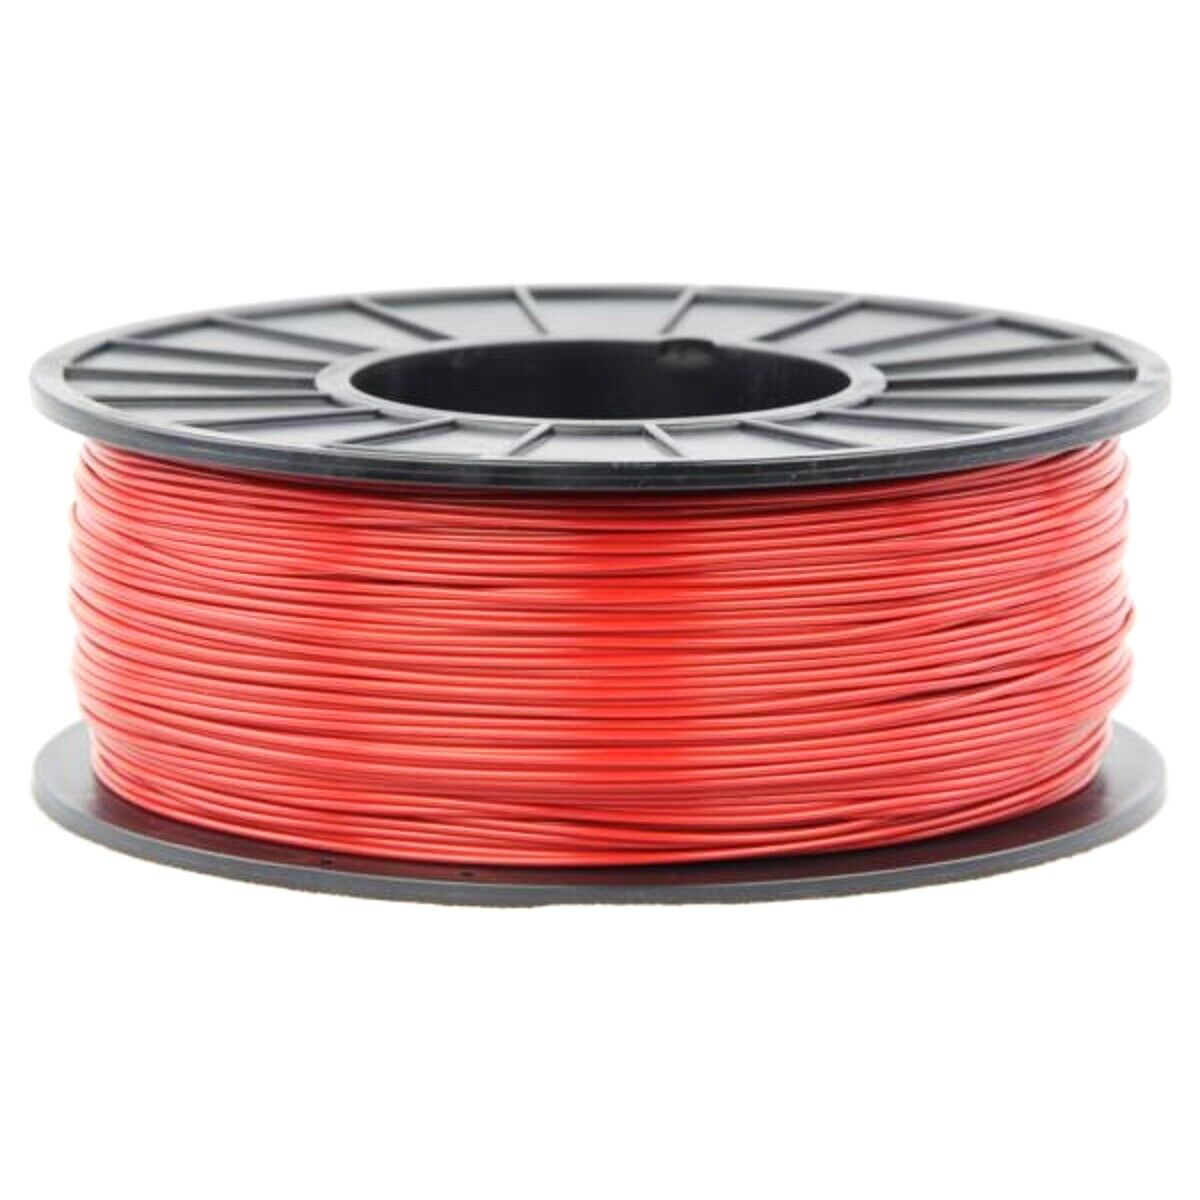 [3DMakerWorld] ABS (PA-747) Filament - 1.75mm, 1kg, Red